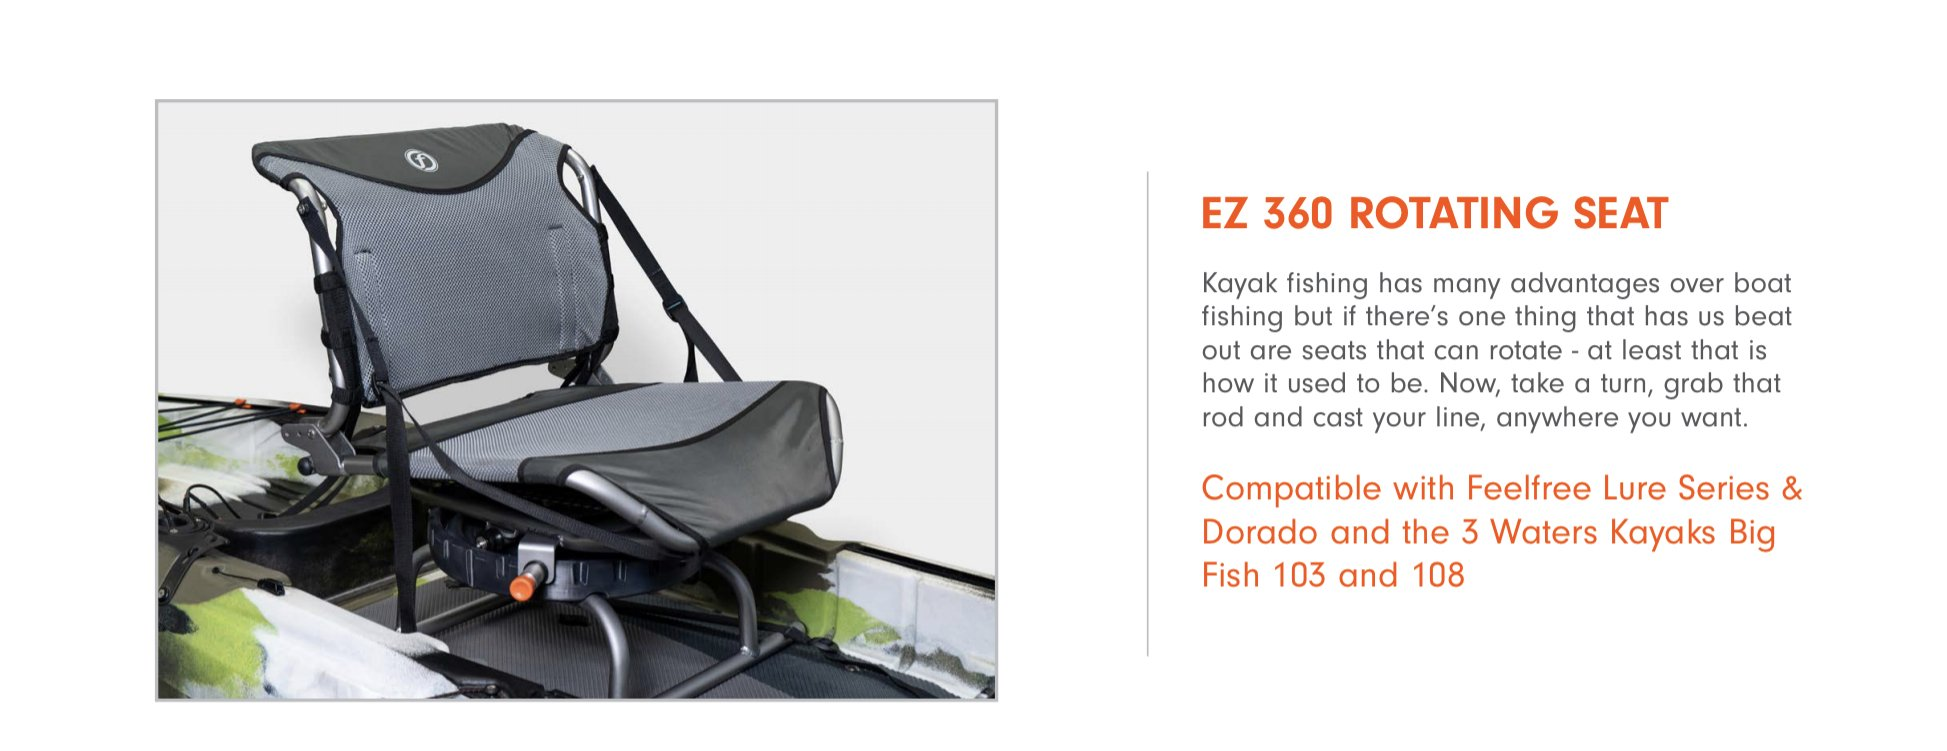 EZ 360 Rotating seat big fish